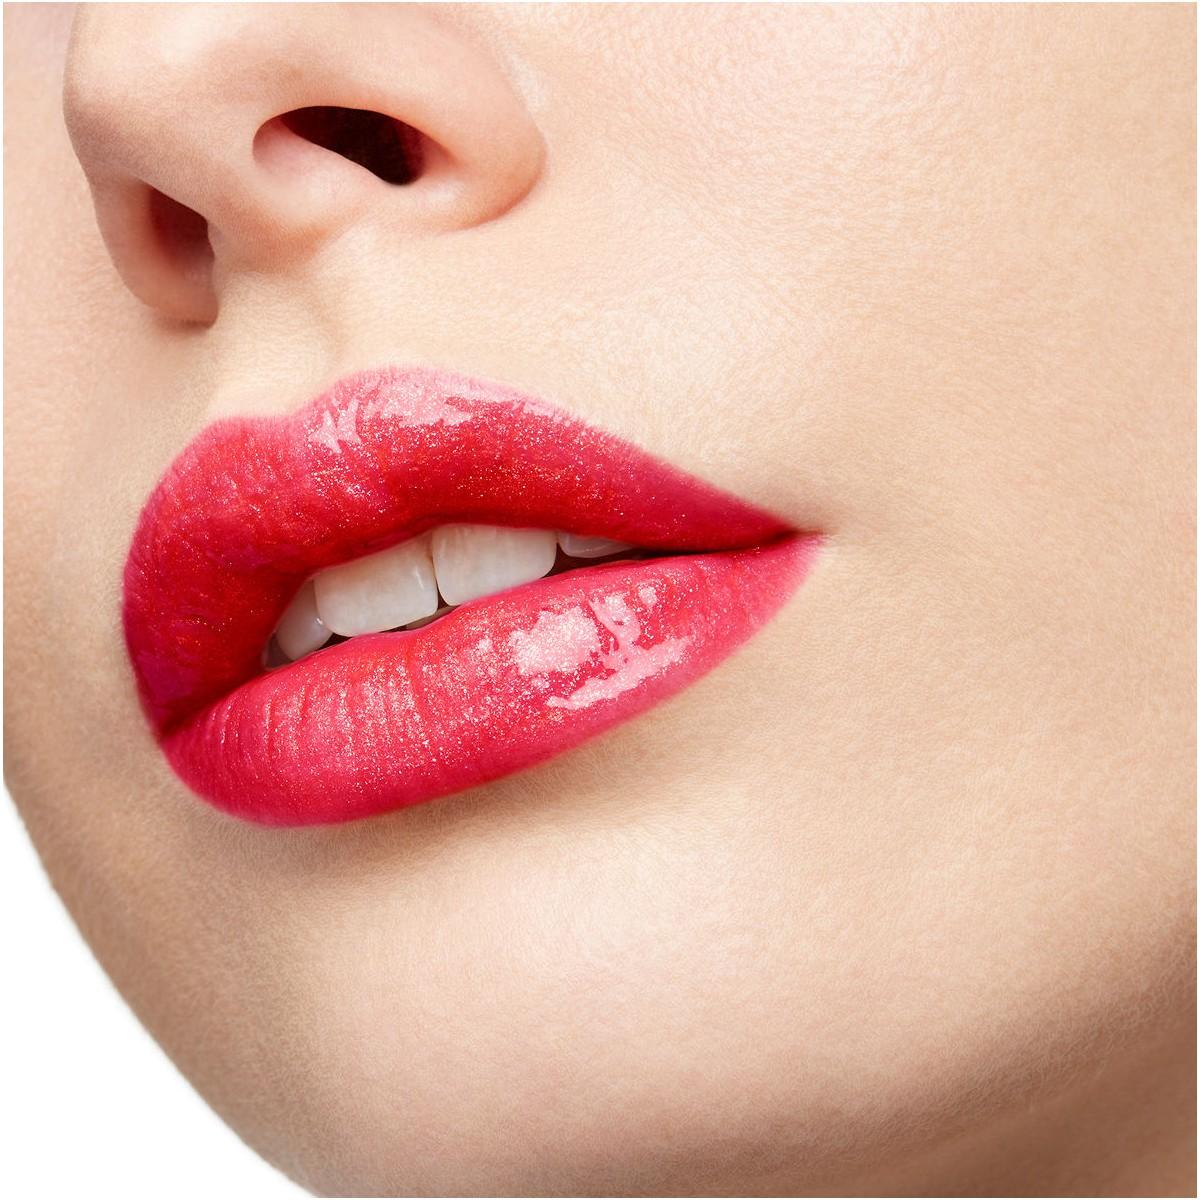 Beauty - Alminette Loubiglittergloss - Christian Louboutin